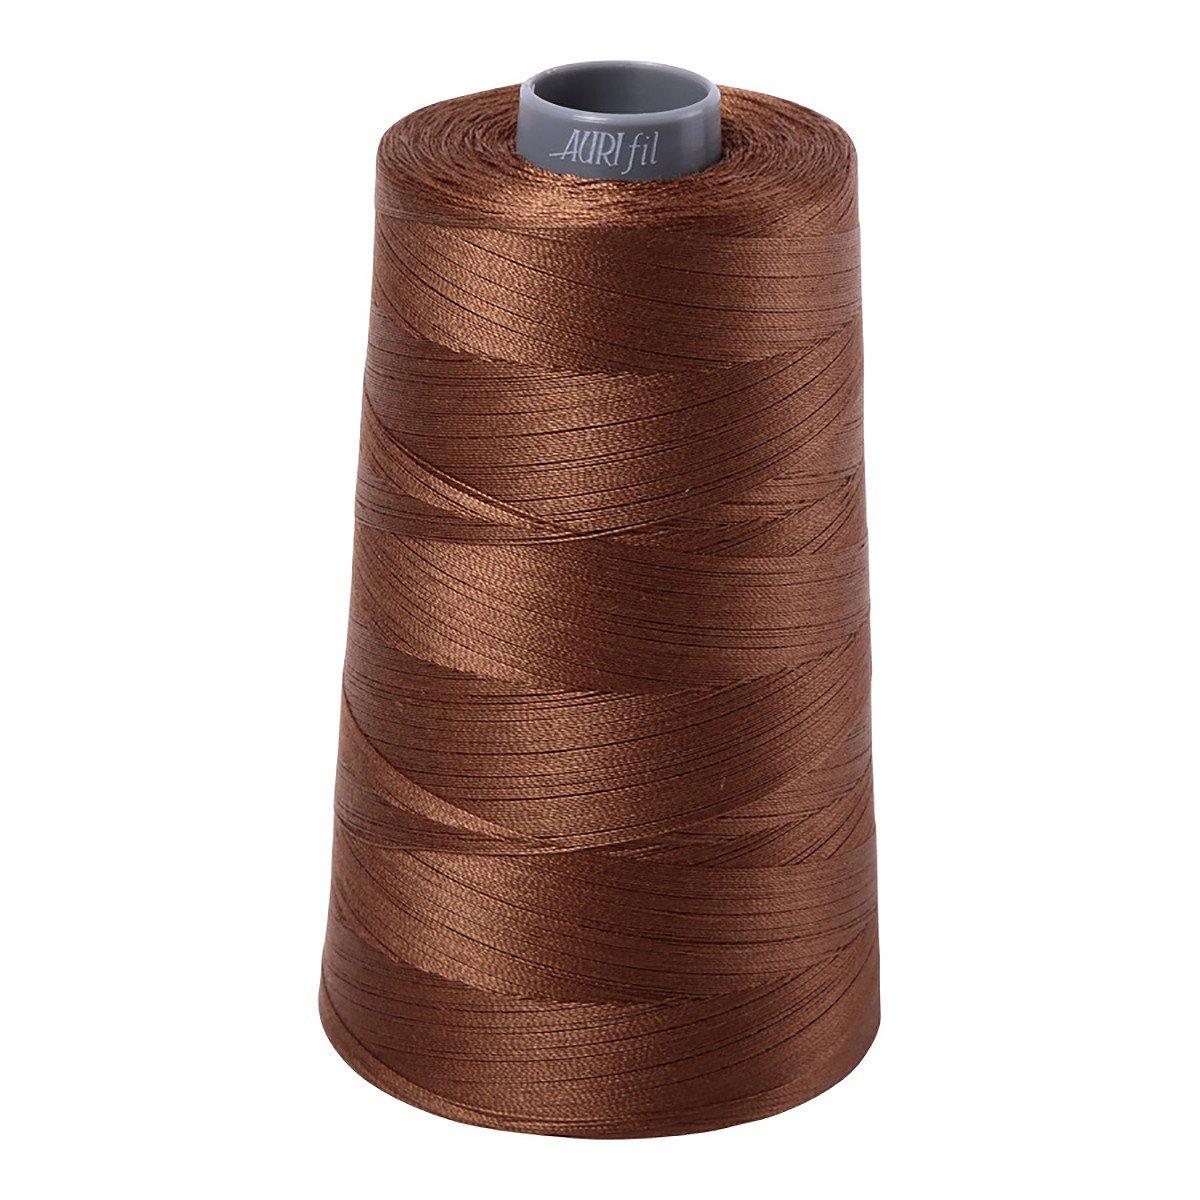 Mako (Cotton) Embroidery Thread 28wt 3609yds Dark Antique Gold